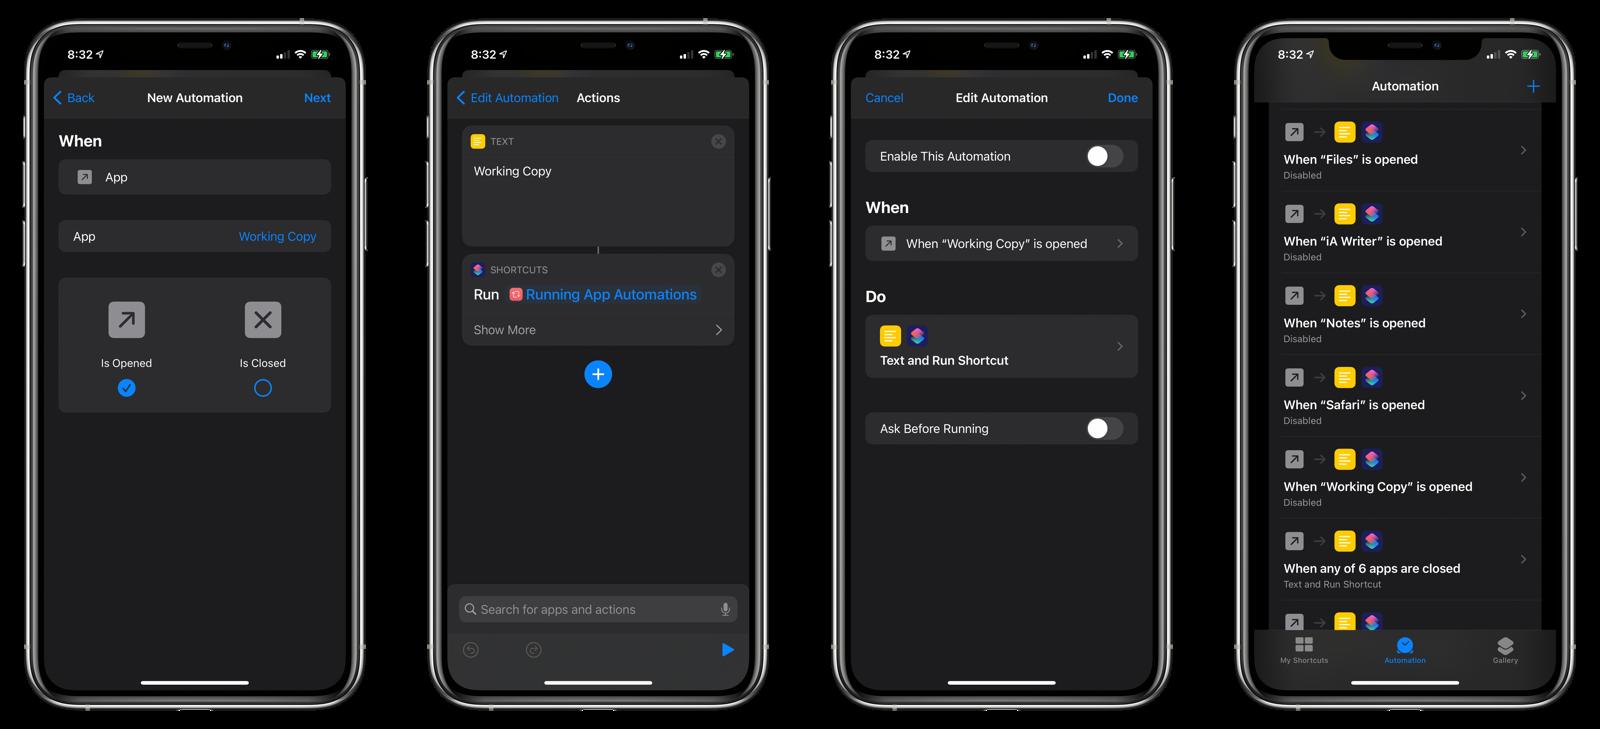 Open App automation setup #2